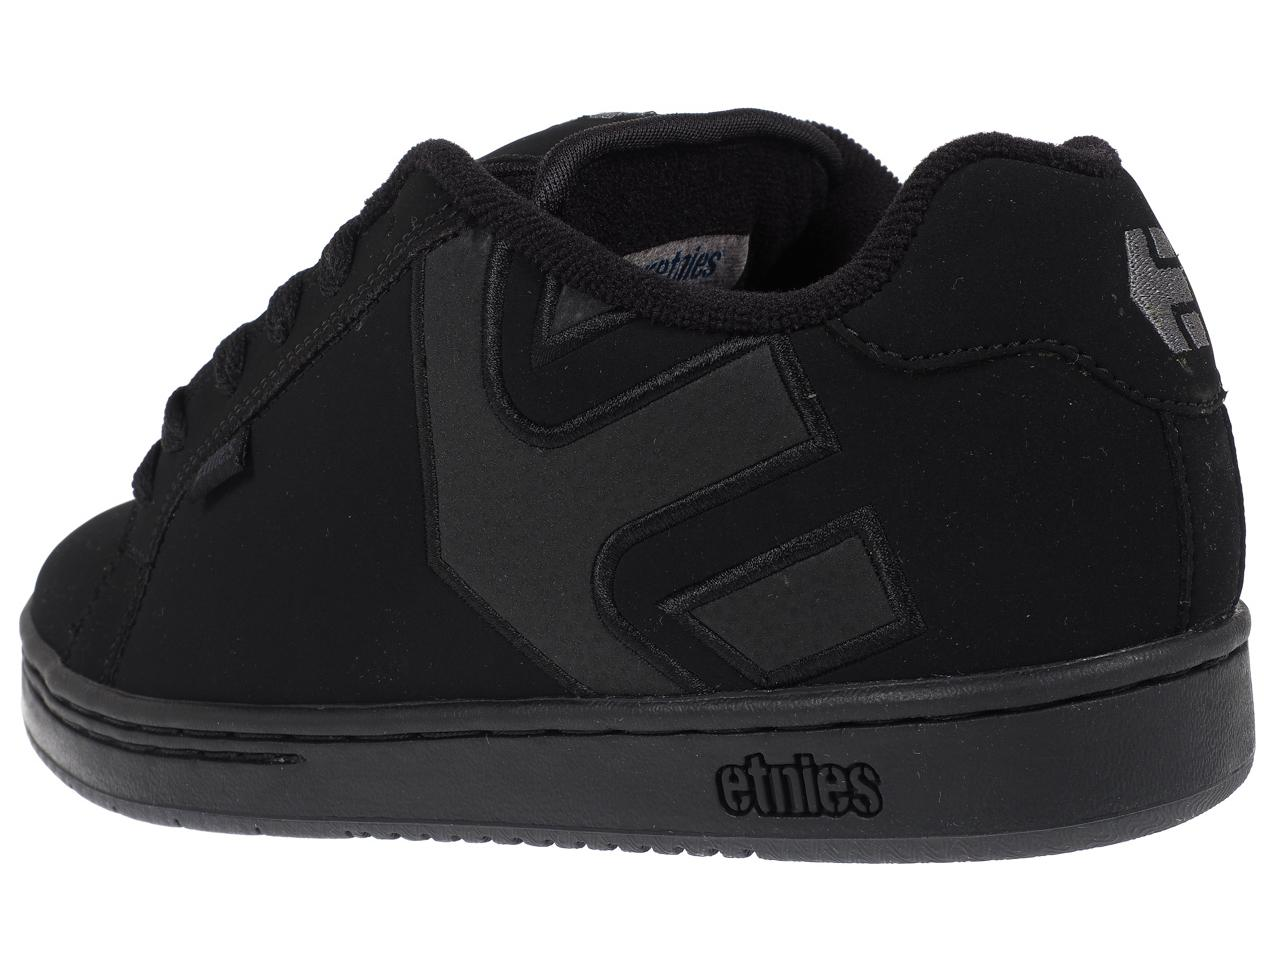 Shoes-Skateboard-Etnies-Fader-Black-Dirty-Wash-Black-42823-New thumbnail 3